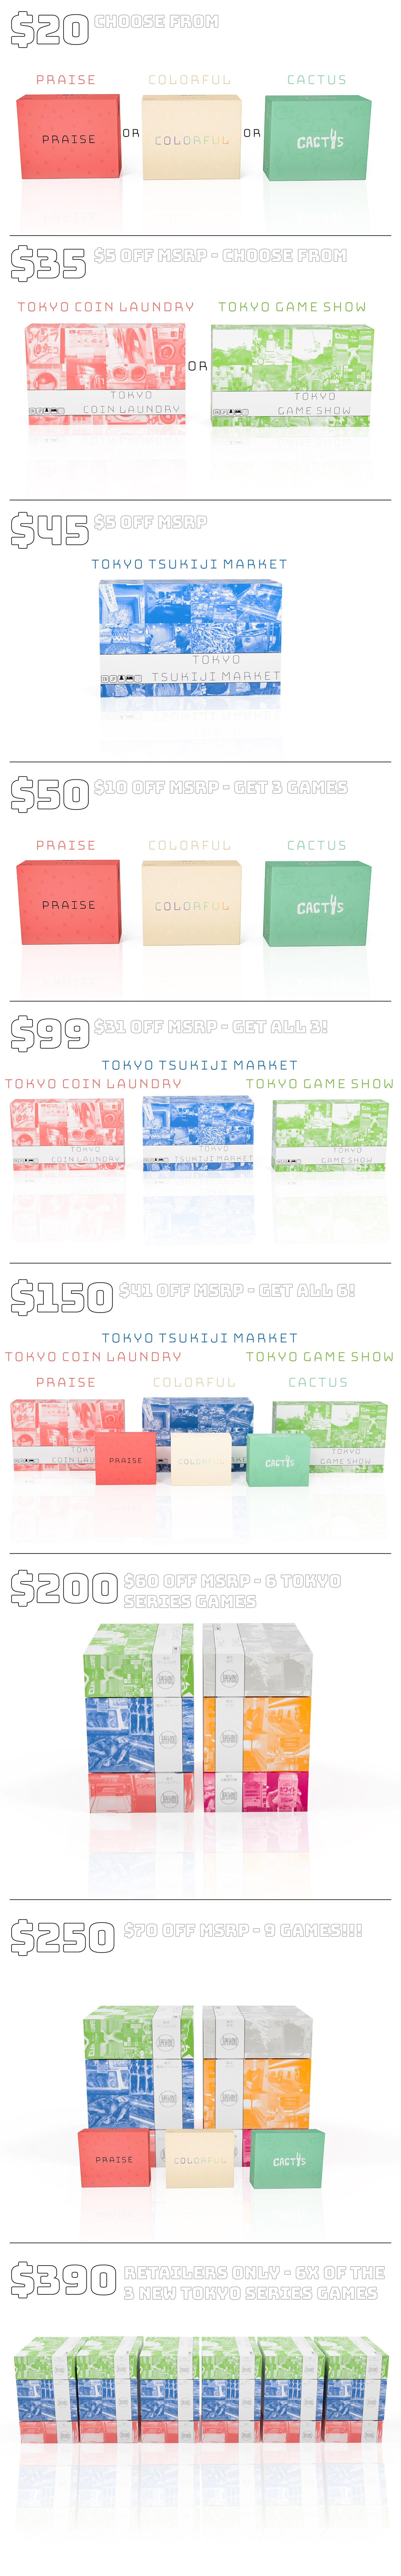 a12239398fd1 TOKYO SERIES TABLETOP GAMES by Jordan Draper — Kickstarter